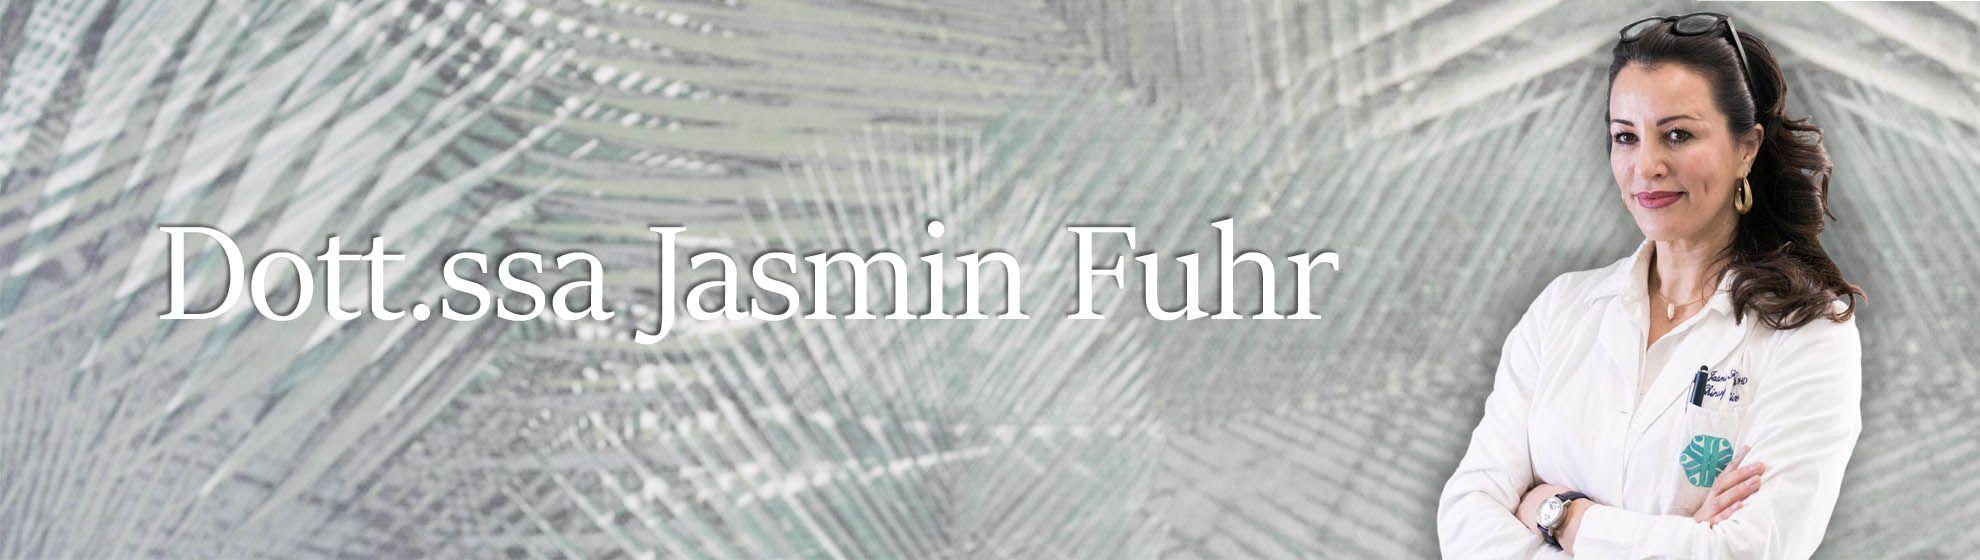 Dott.ssa Jasmin Fuhr